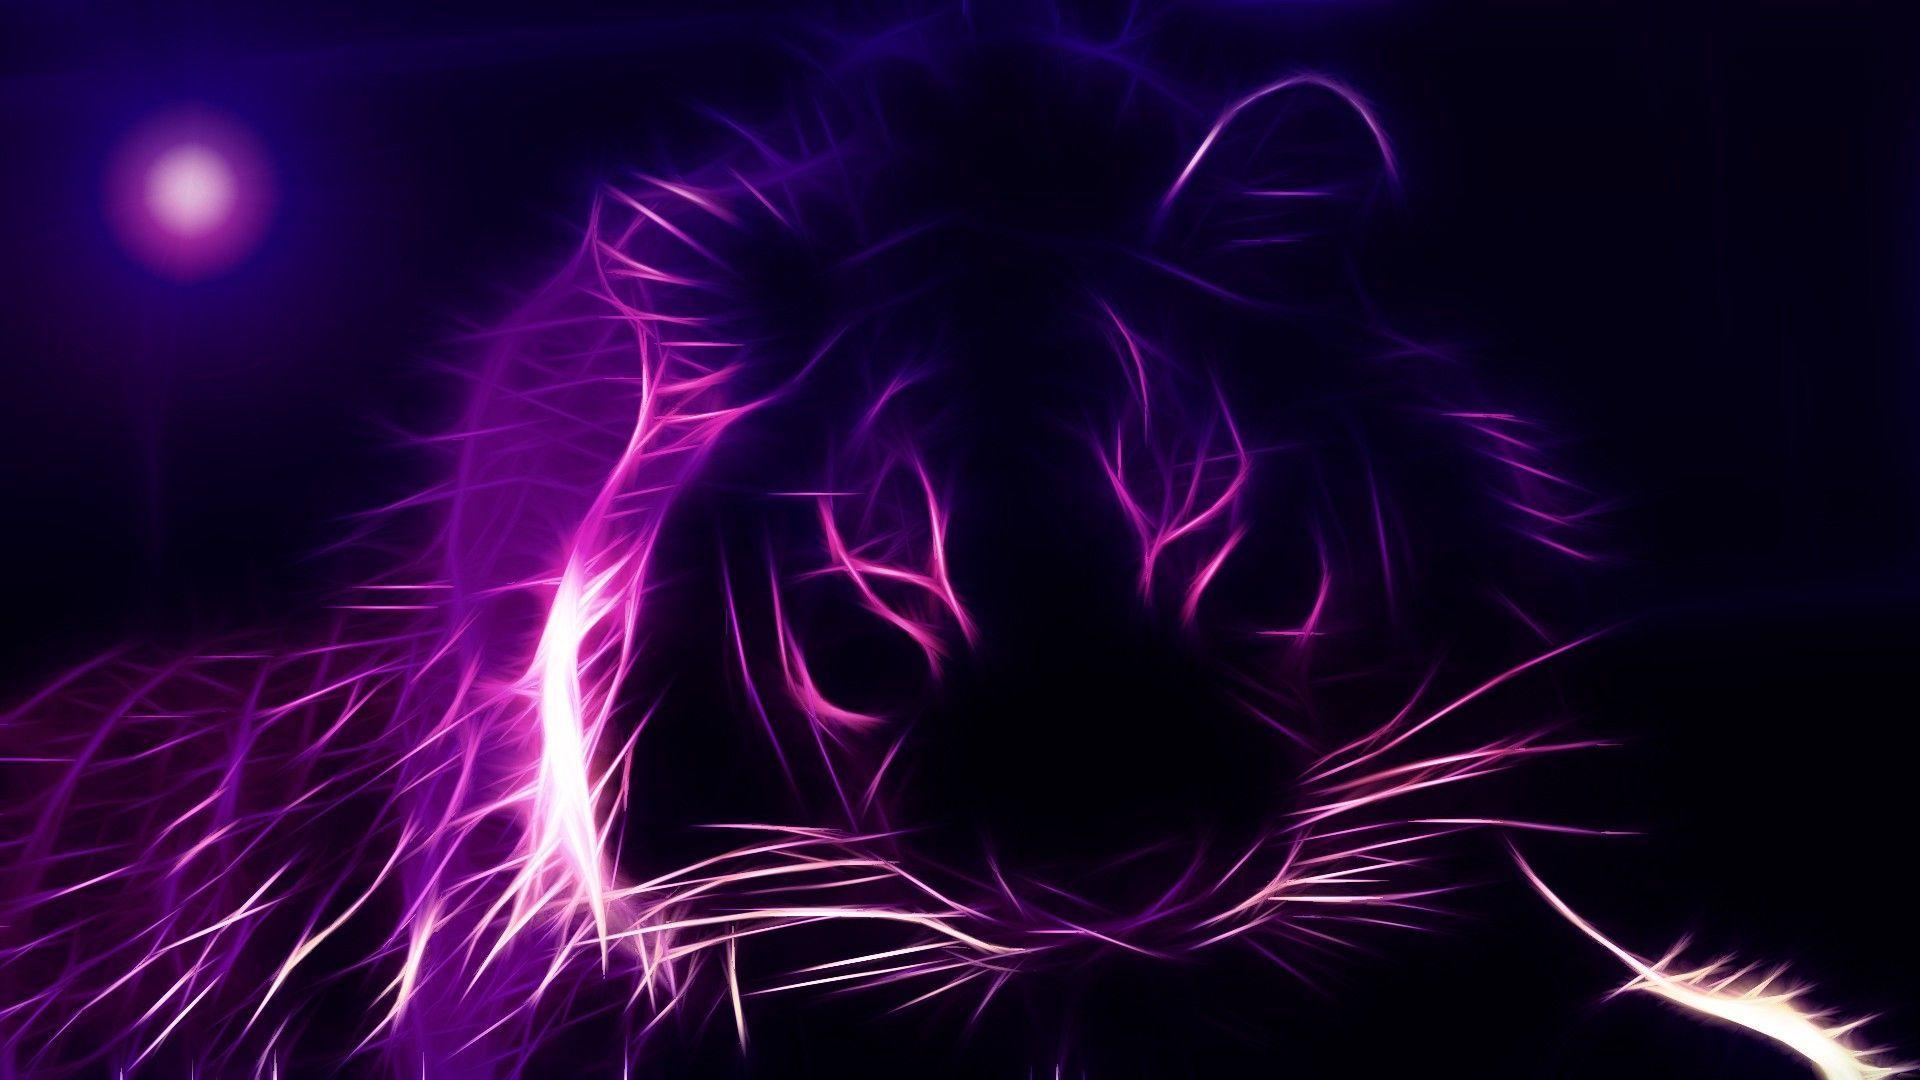 Purple Desktop Wallpapers Top Free Purple Desktop Backgrounds Wallpaperaccess